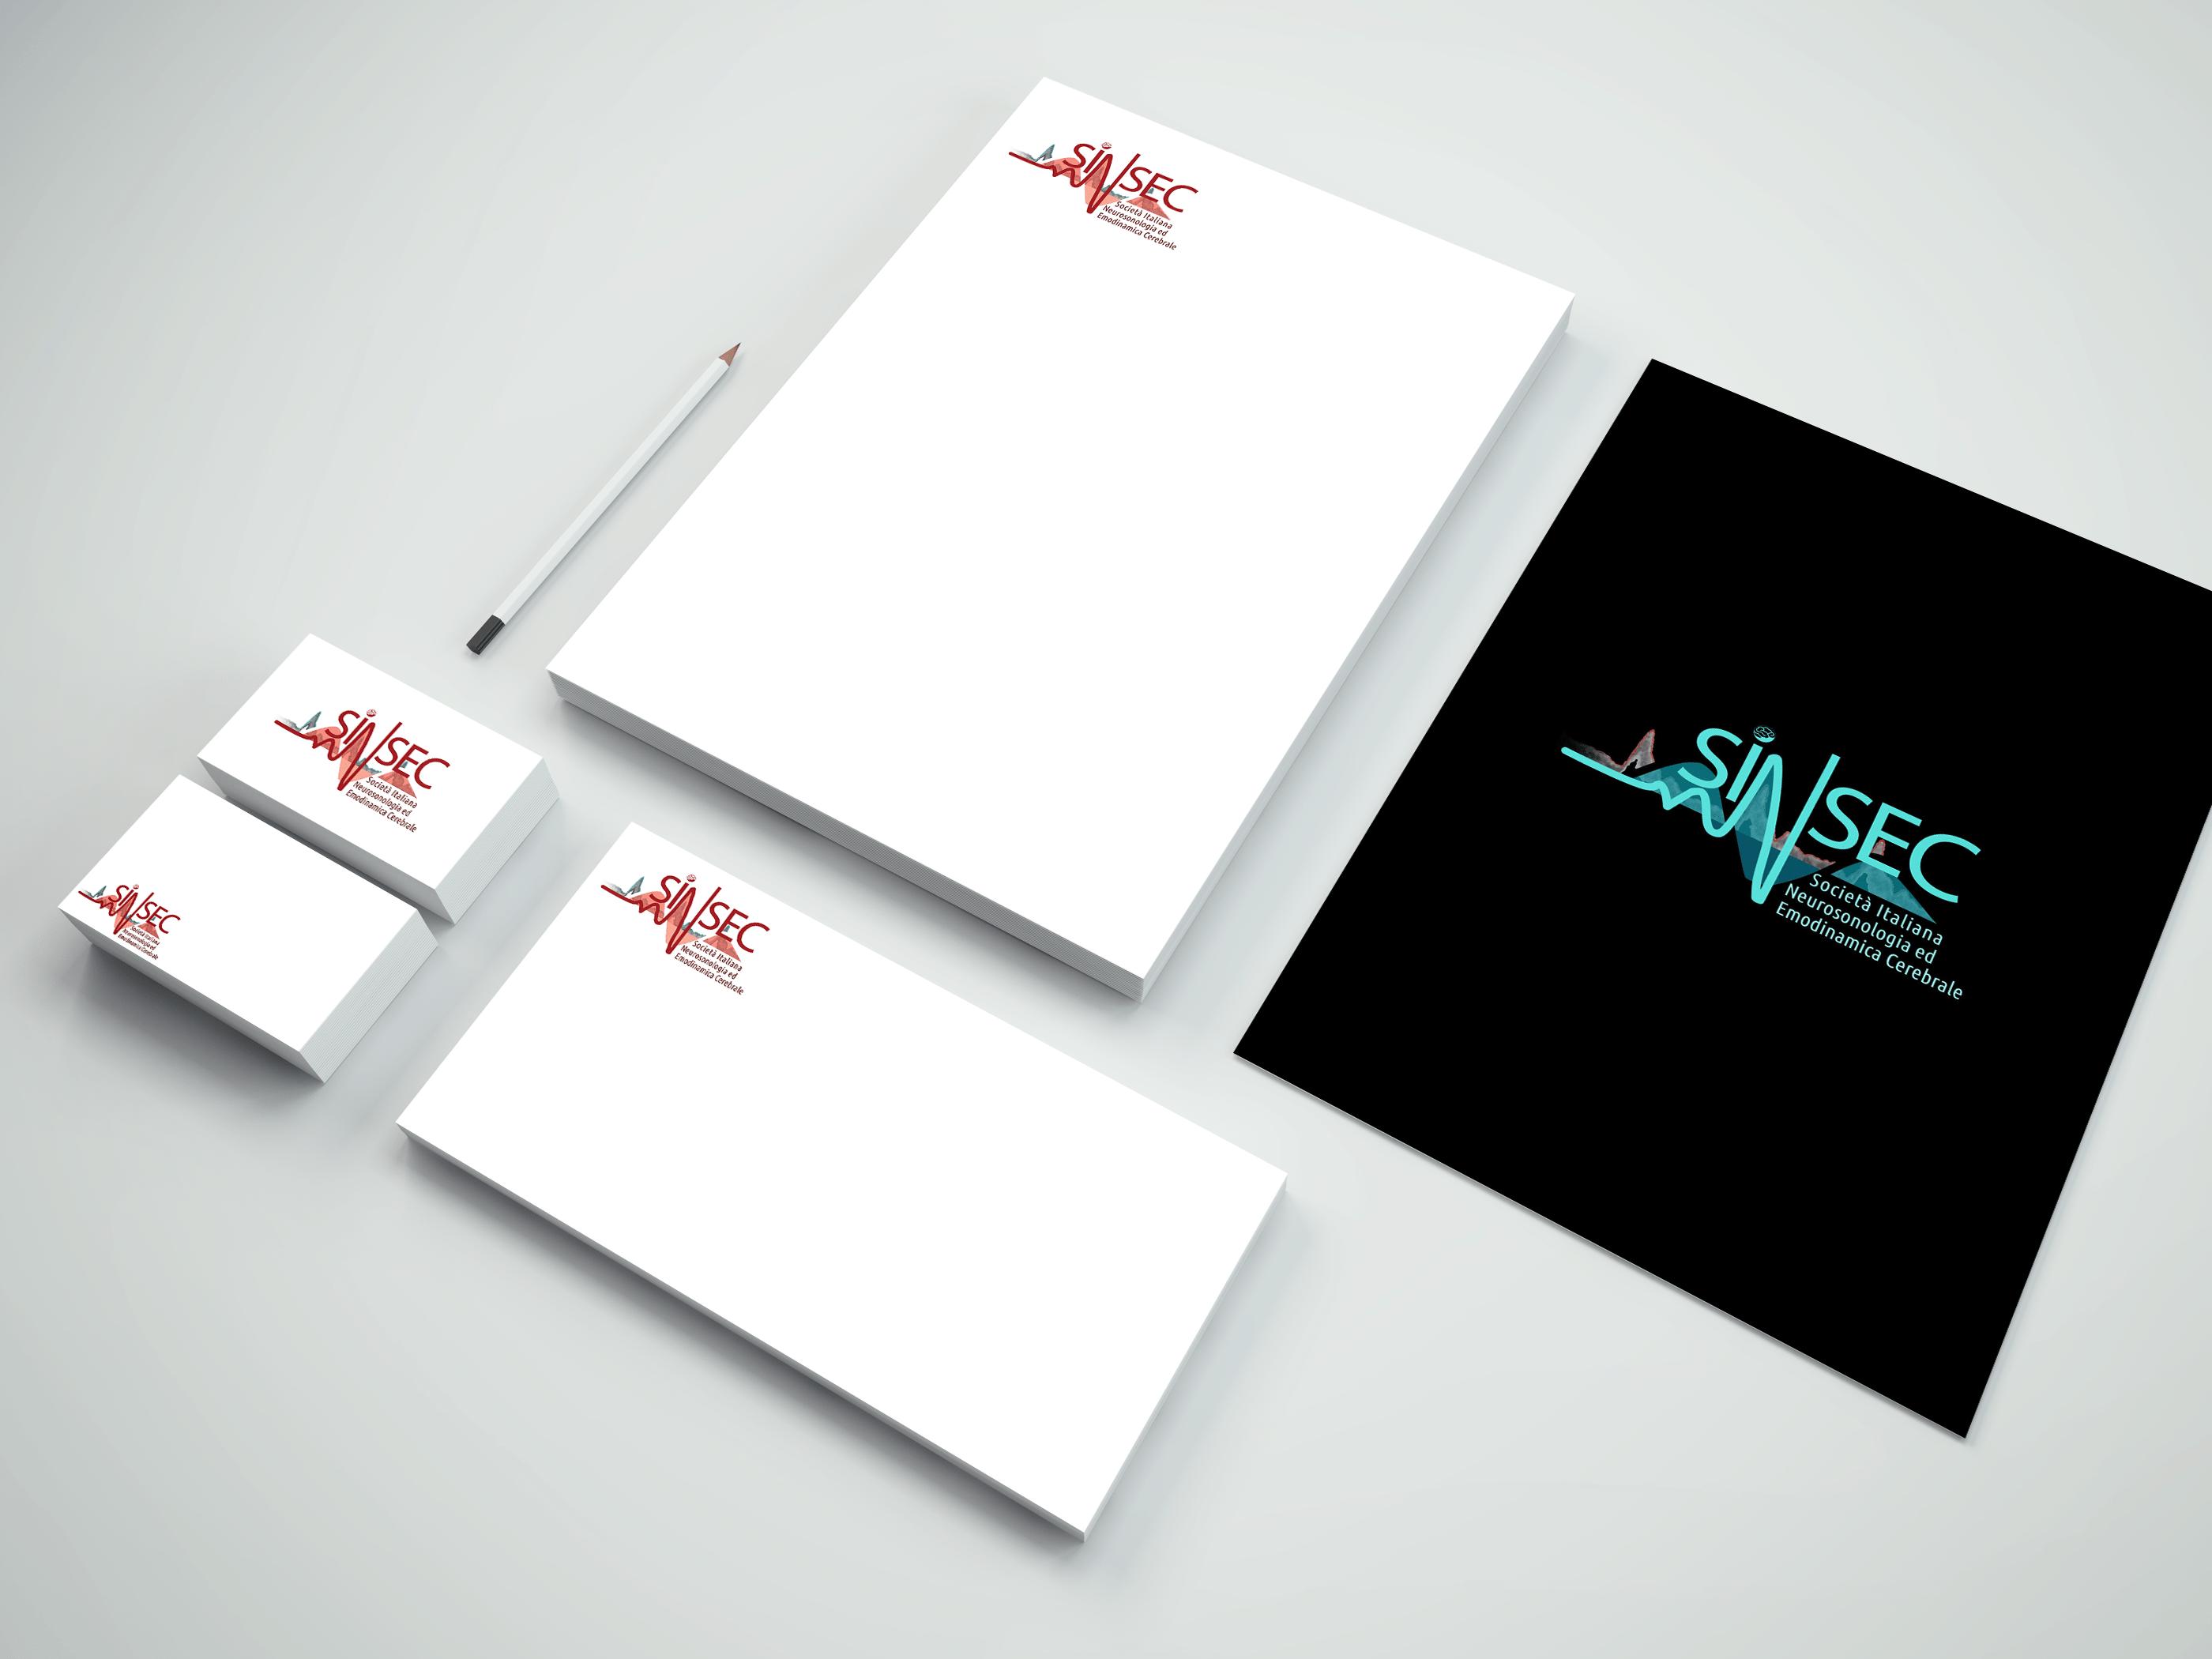 Branding-SINSEC